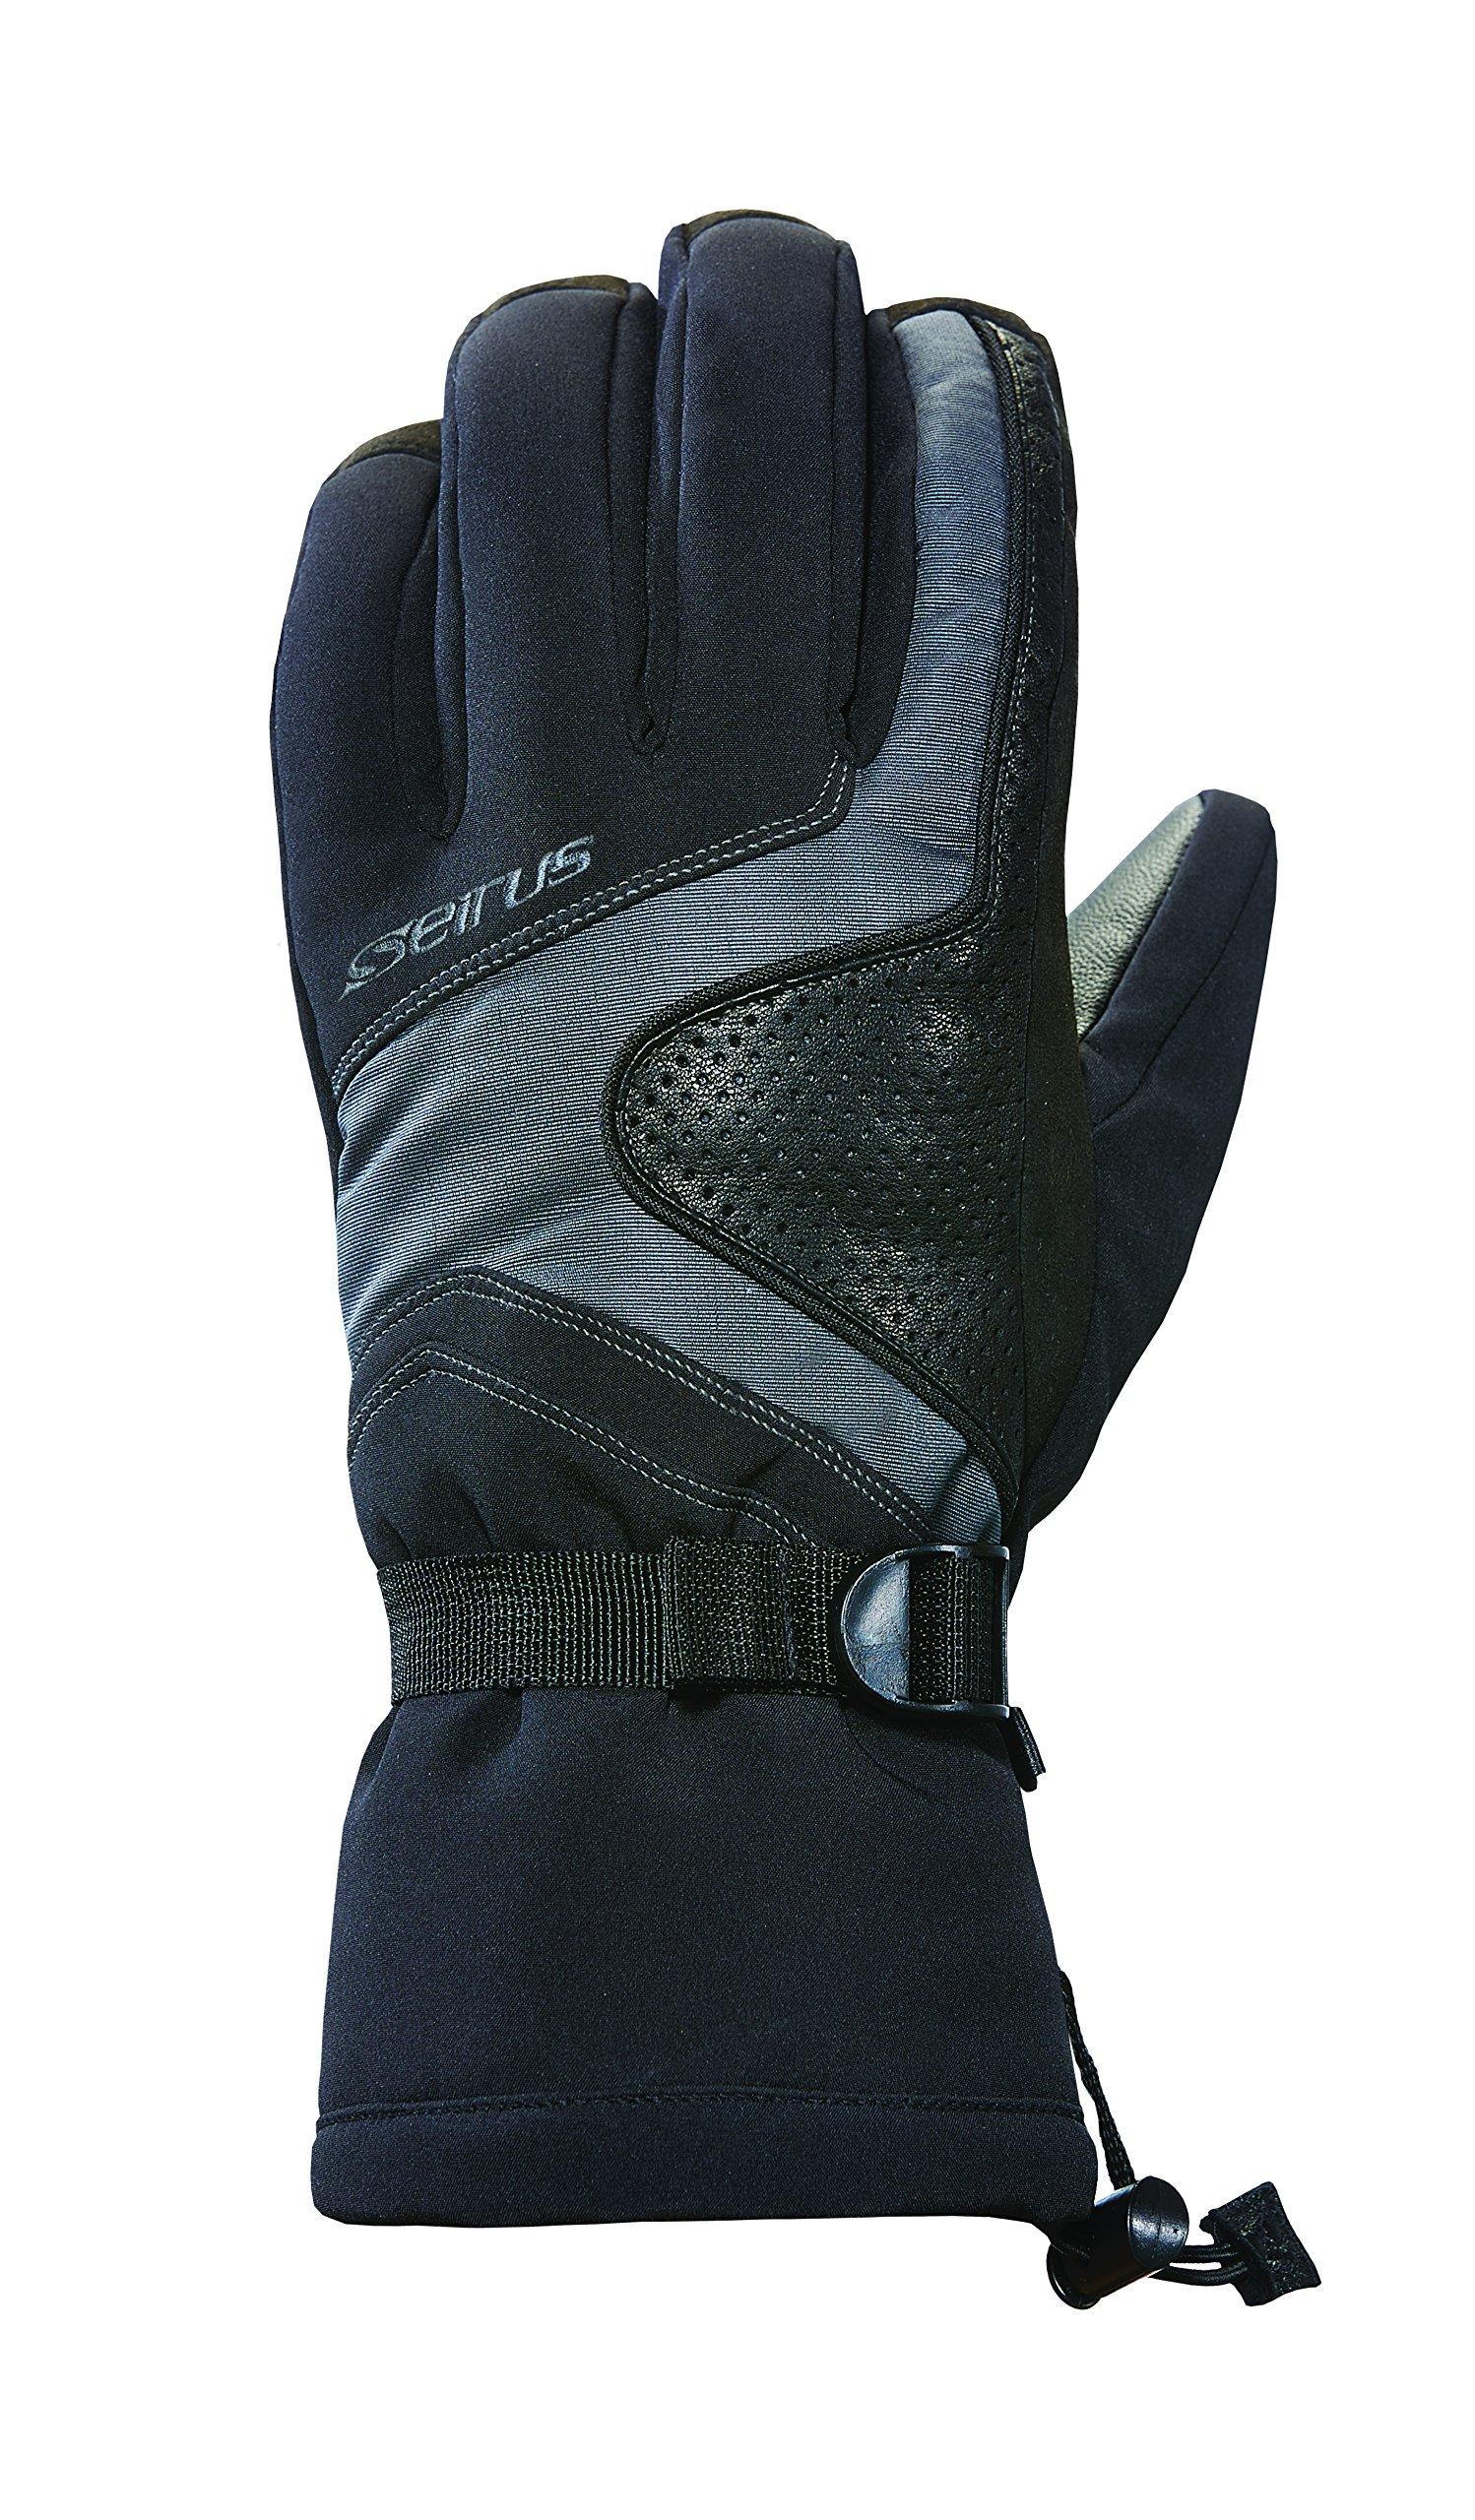 Seirus Innovation Men's Heatwave Plus Shine Cold Weather Waterproof Gloves, Black, Medium